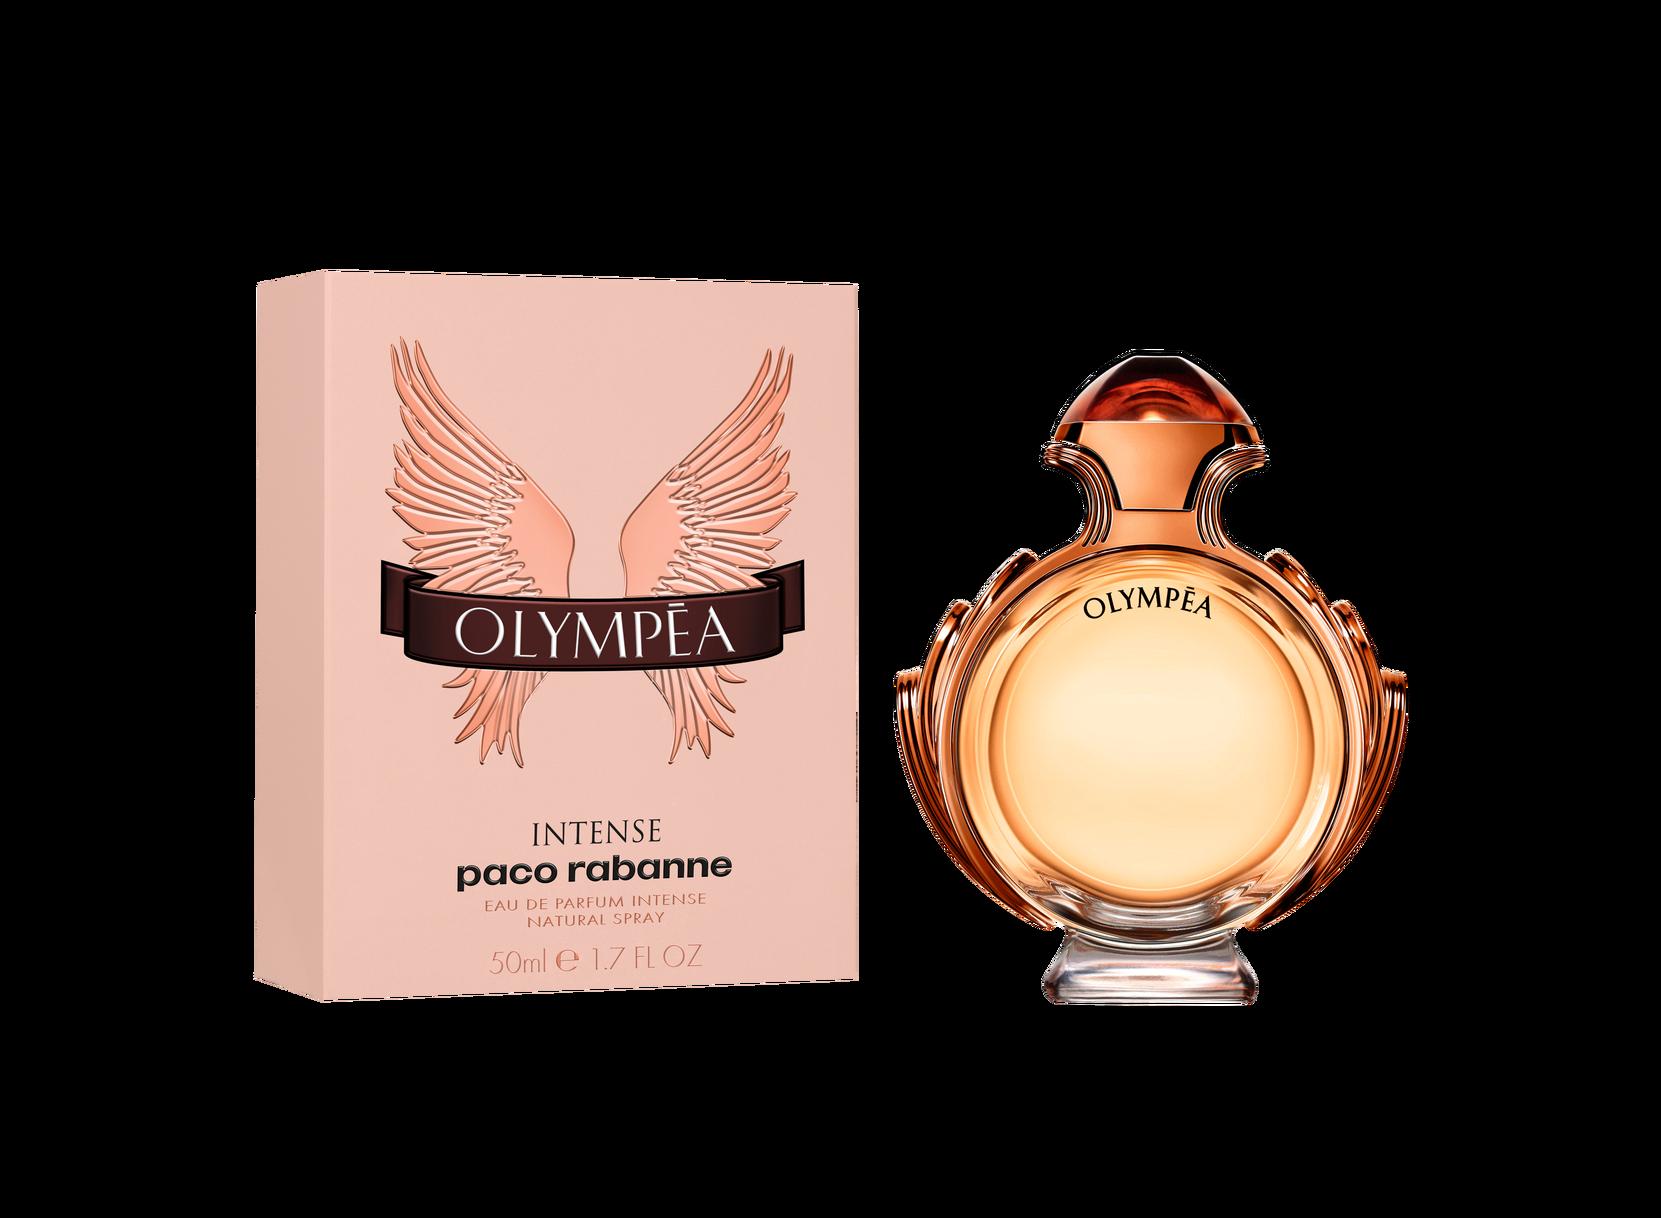 Olympea Intense Edp 50 ml